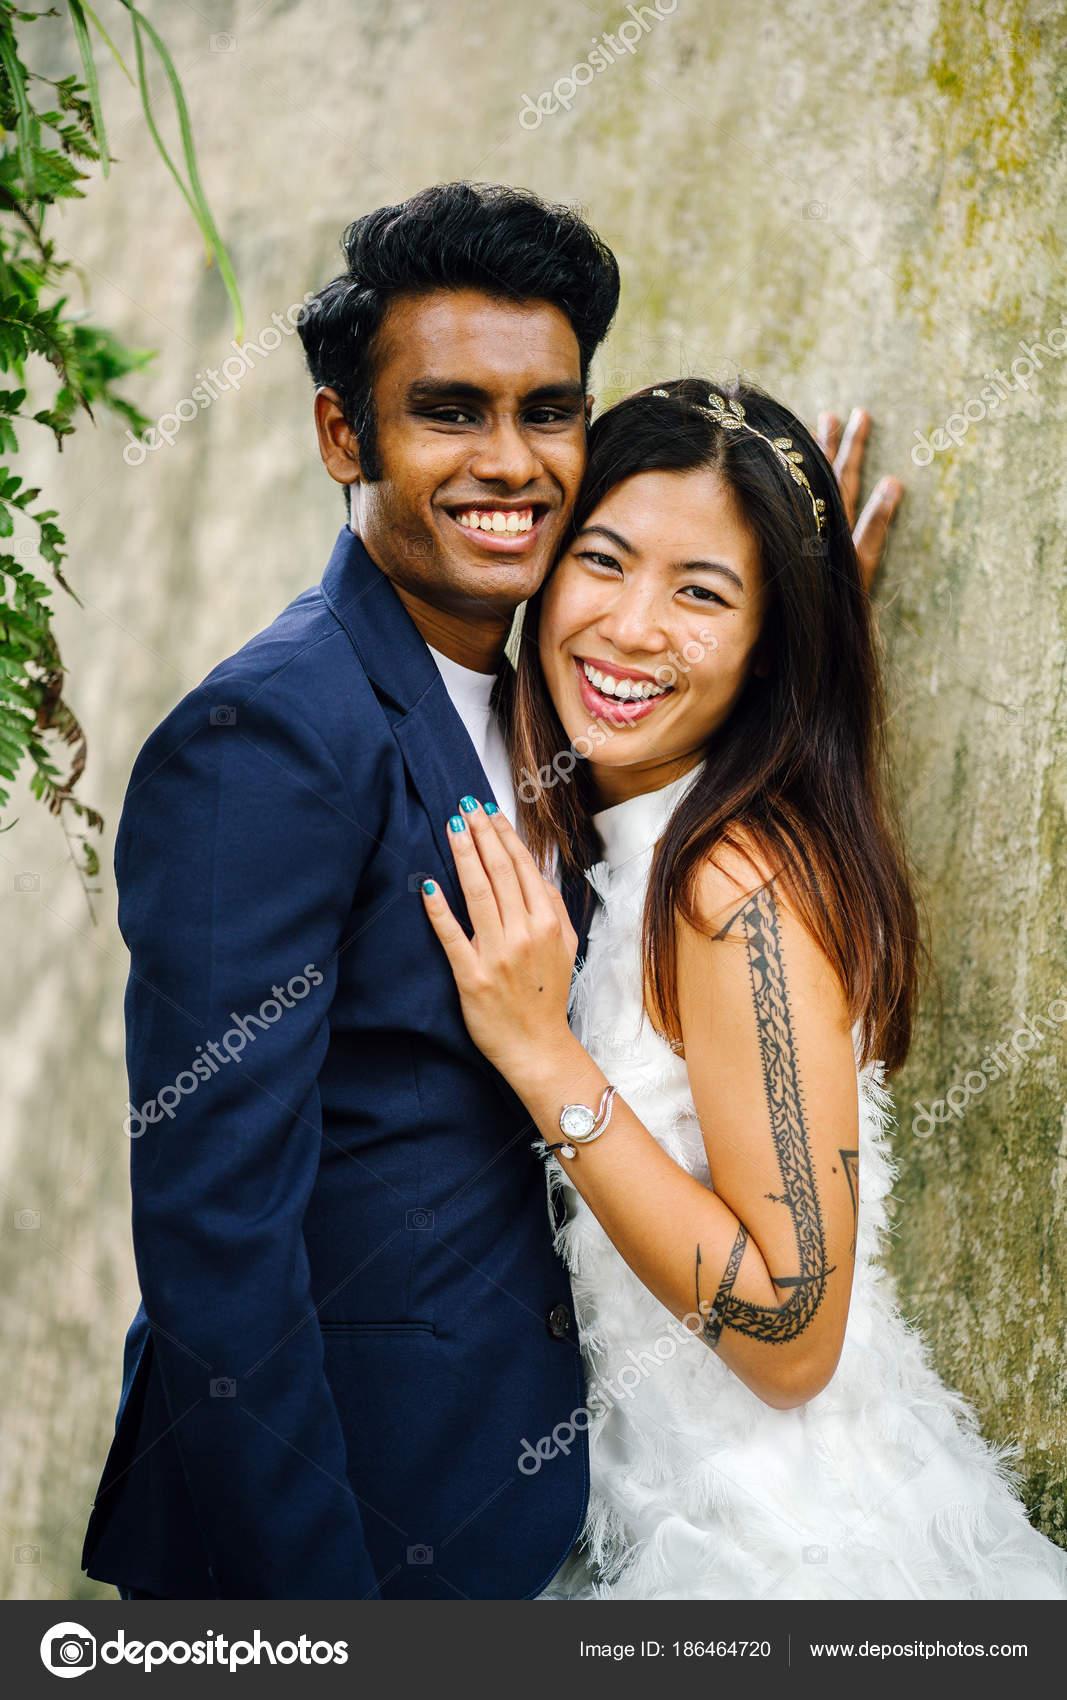 Dating Indian Man